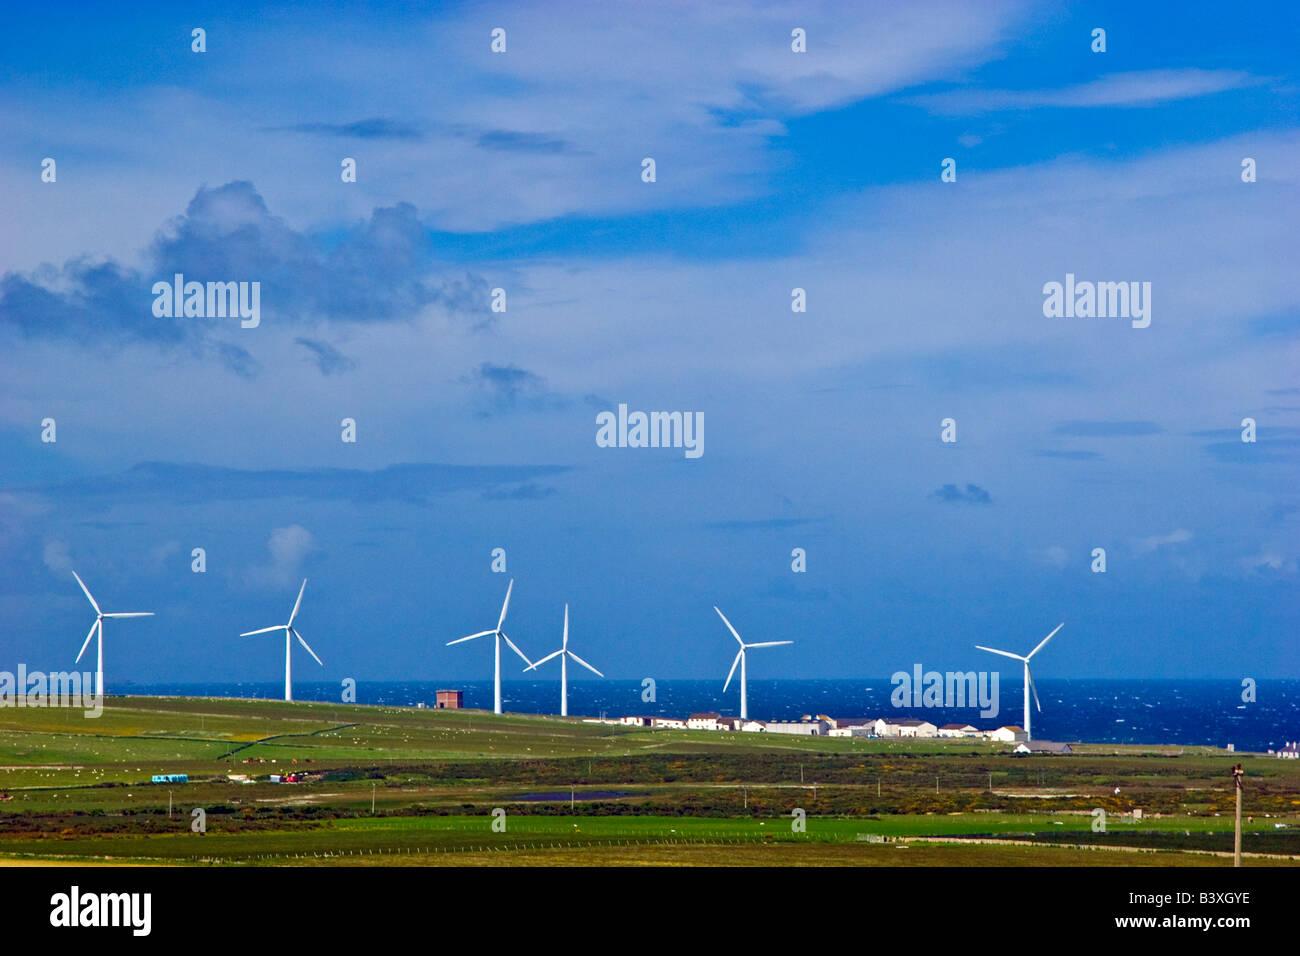 Wind farm near Dounreay Sutherland, Scotland UK 2008 - Stock Image